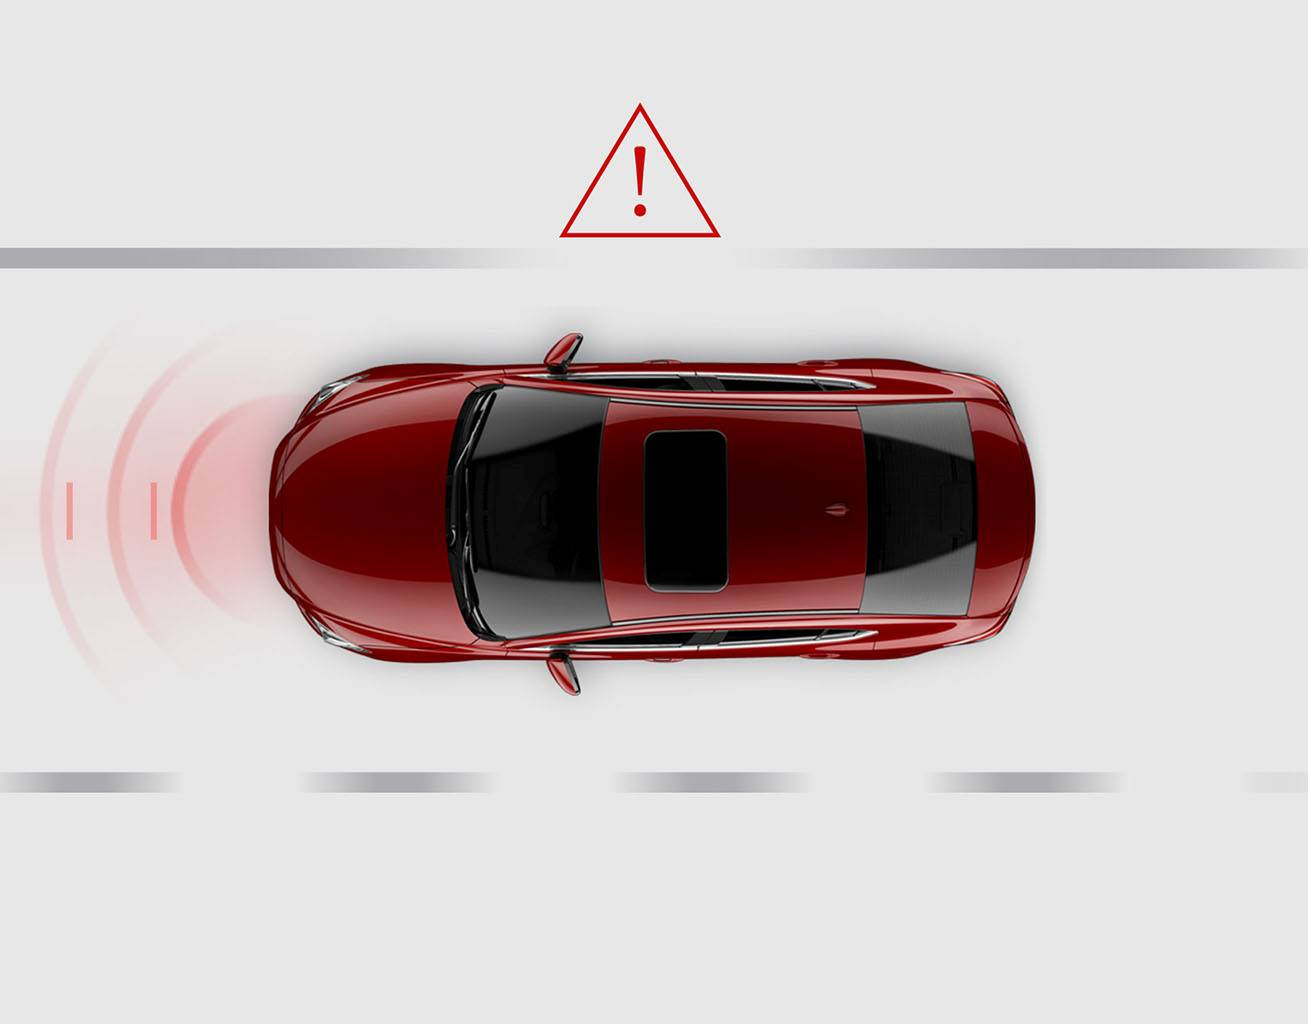 2018 Mazda6, ADVANCED SMART CITY BRAKE SUPPORT